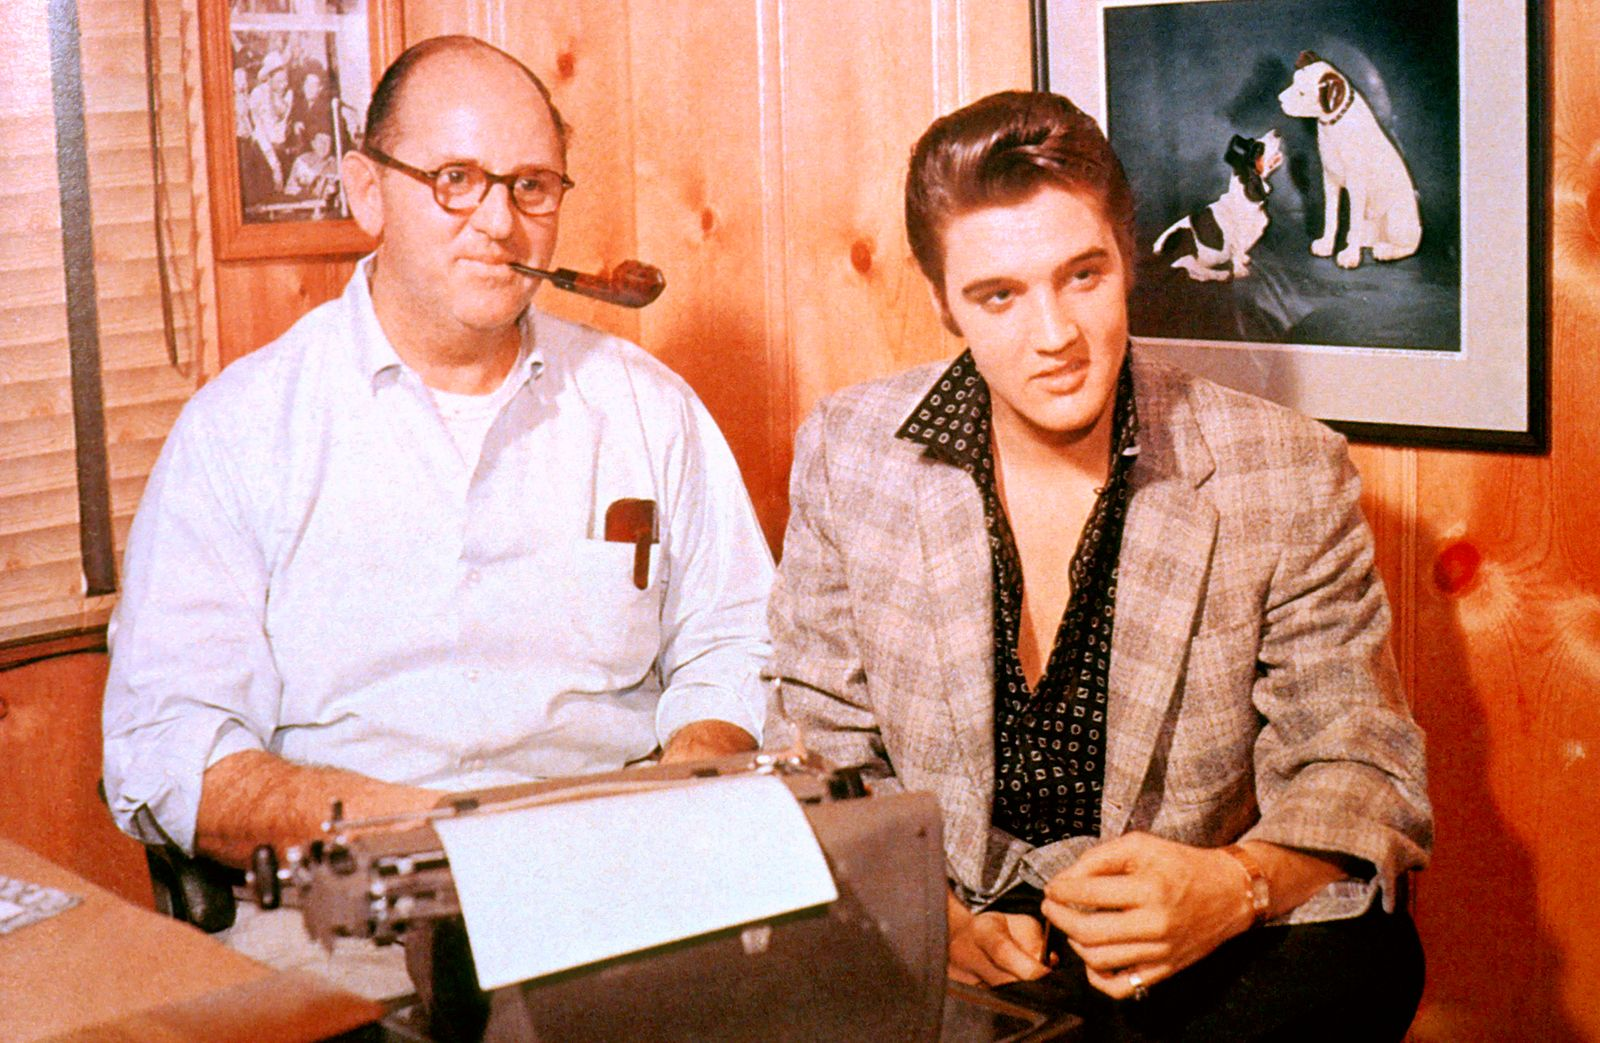 Elvis Presley - Photo of Colonel Tom PARKER and Elvis PRESLEY